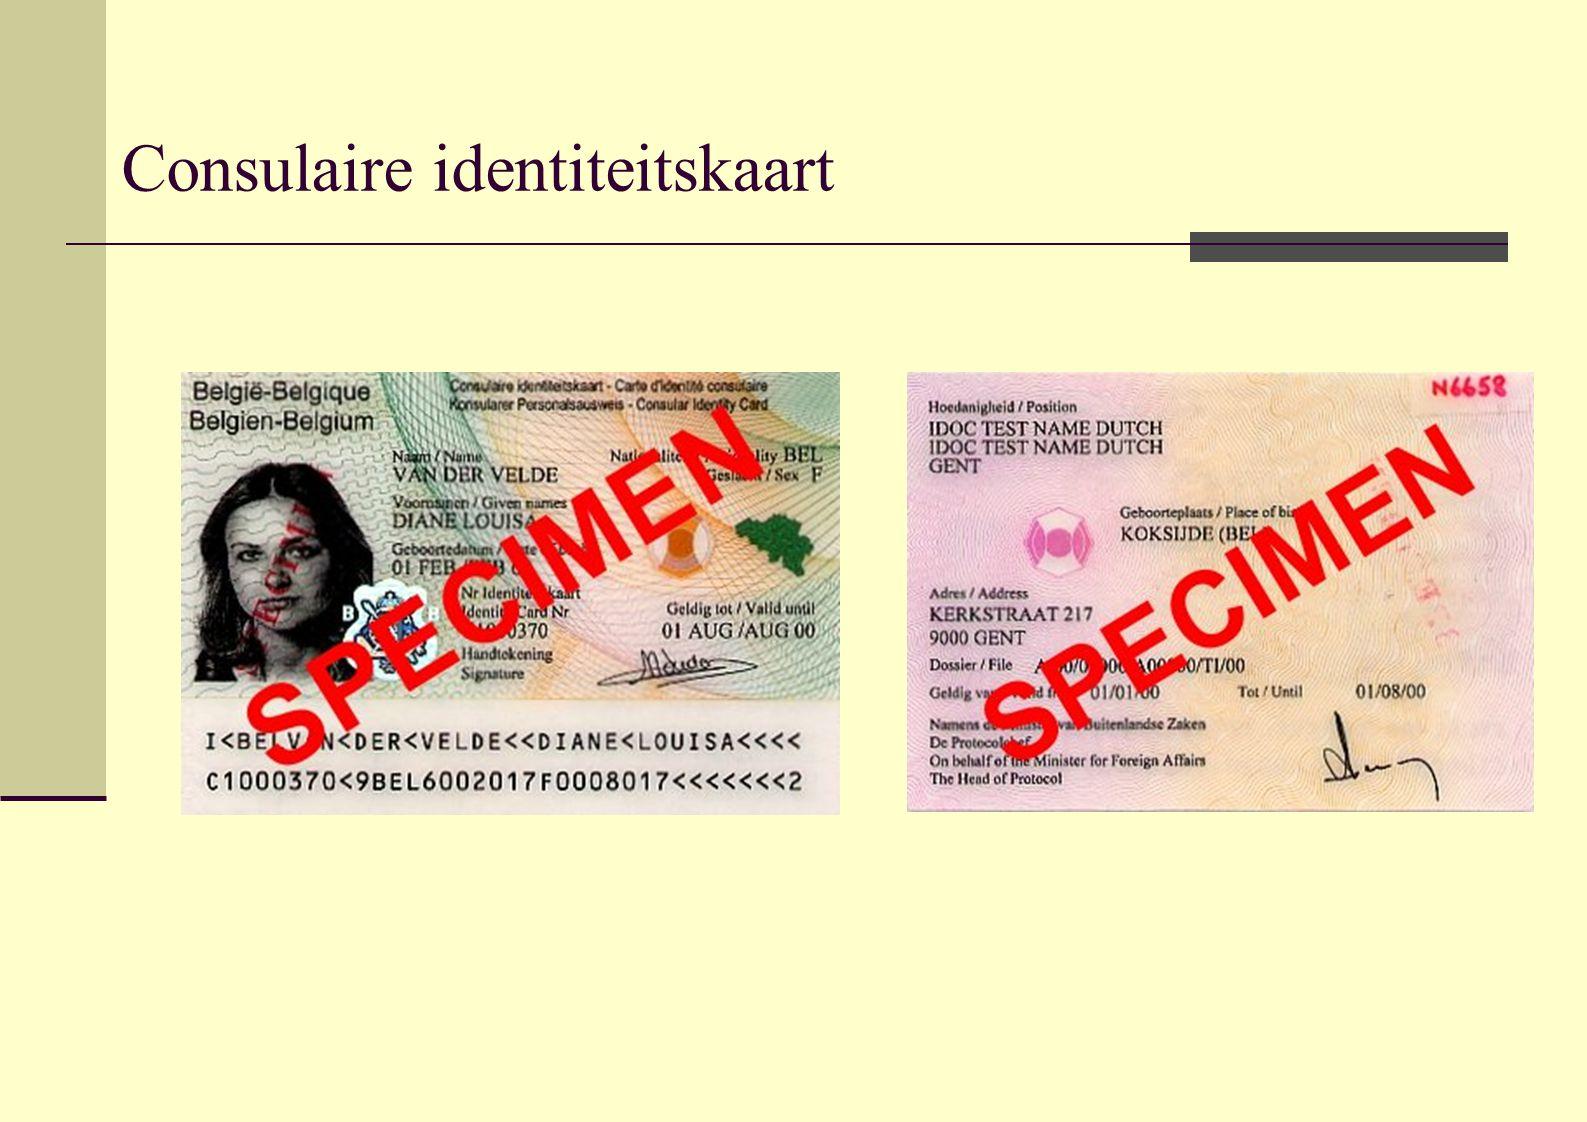 Consulaire identiteitskaart